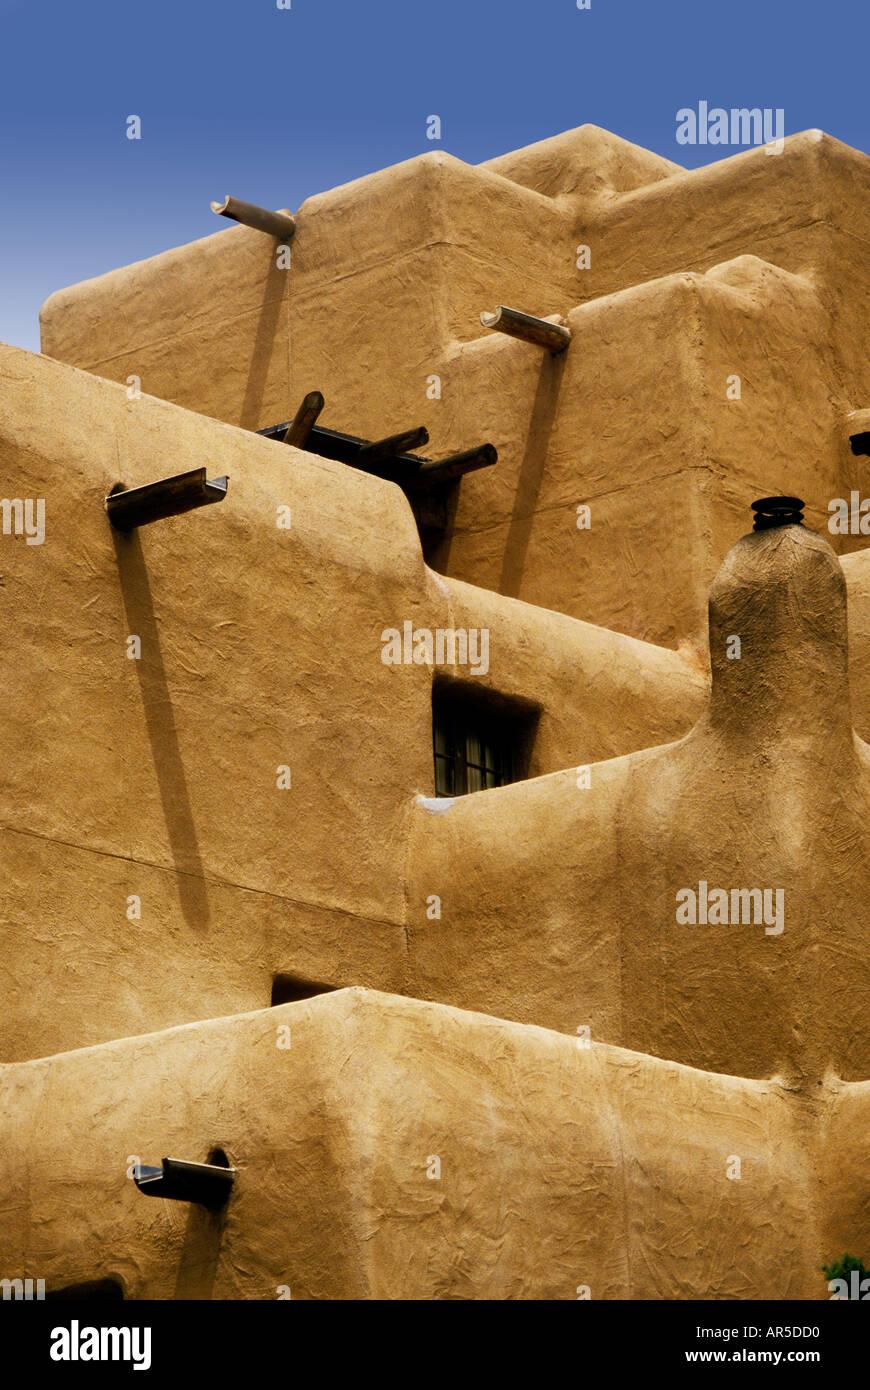 Modern adobe architecture Santa Fe New Mexico USA - Stock Image